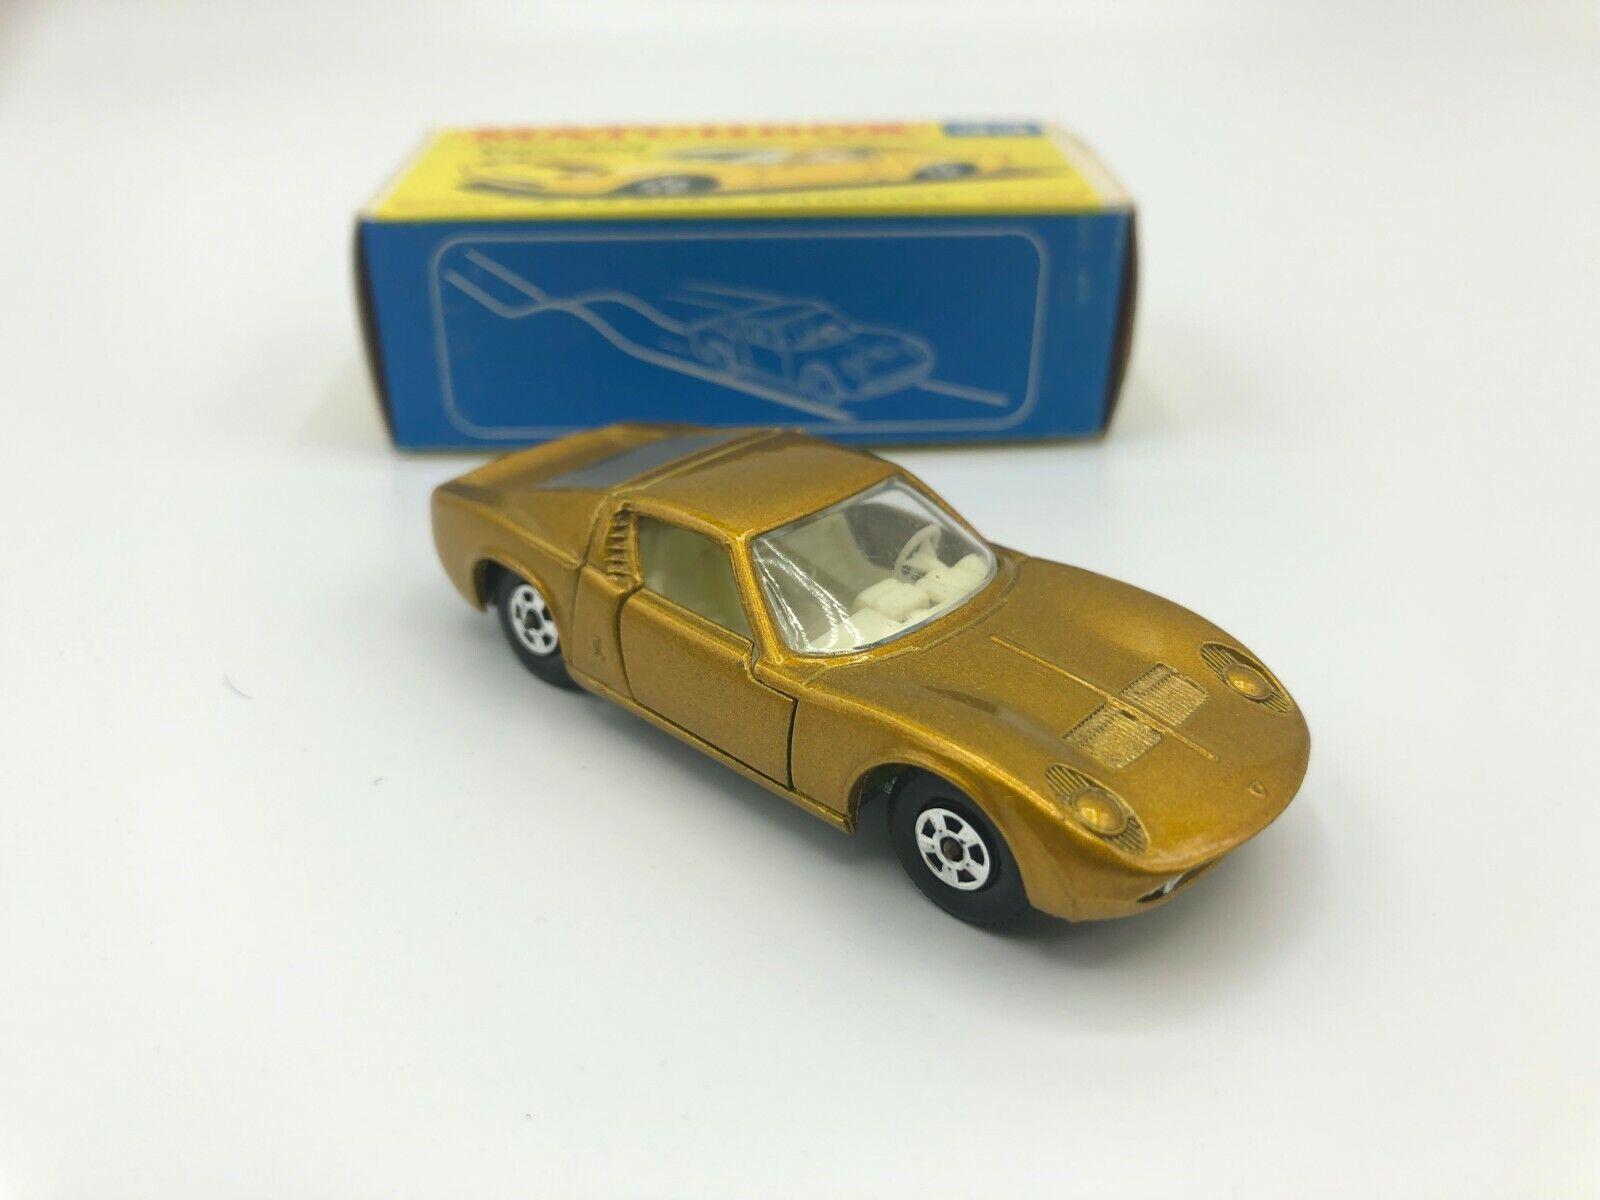 Matchbox Lesney Lamborghini Mura P400 Mint In Original F2 Box